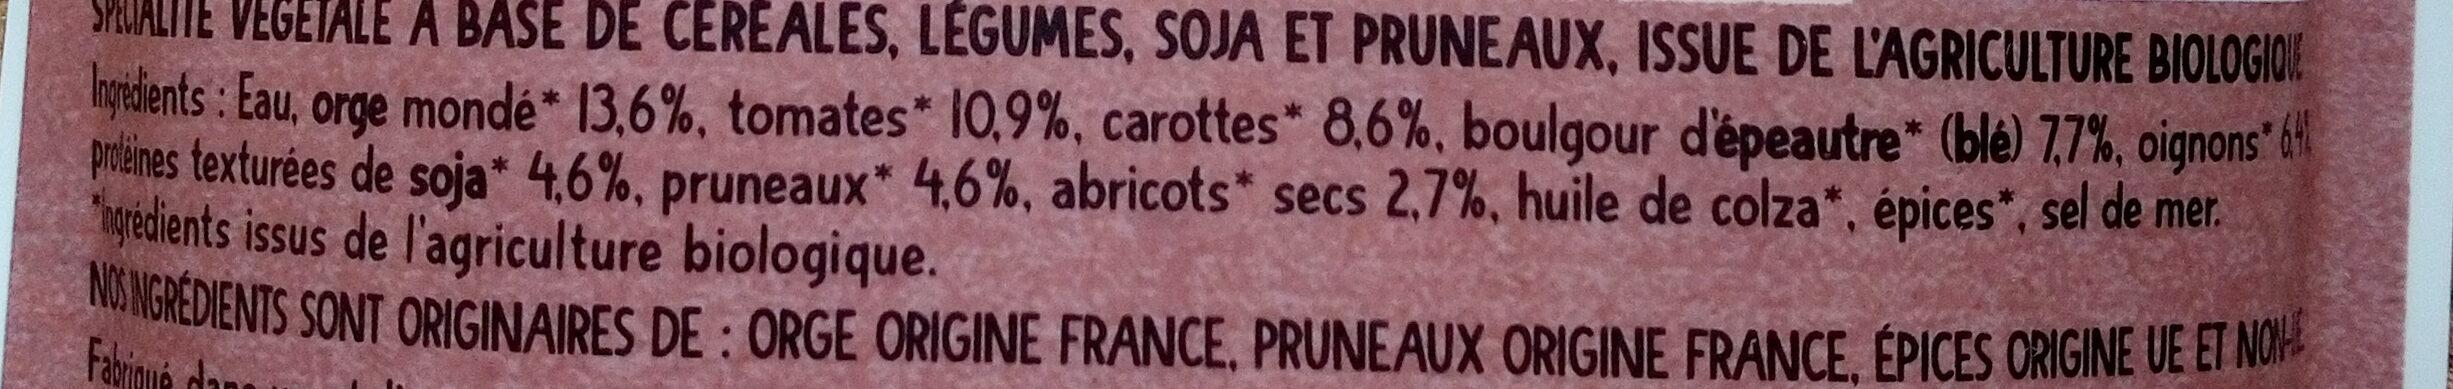 Orge et pruneaux à la Marocaine - Ingredienti - fr